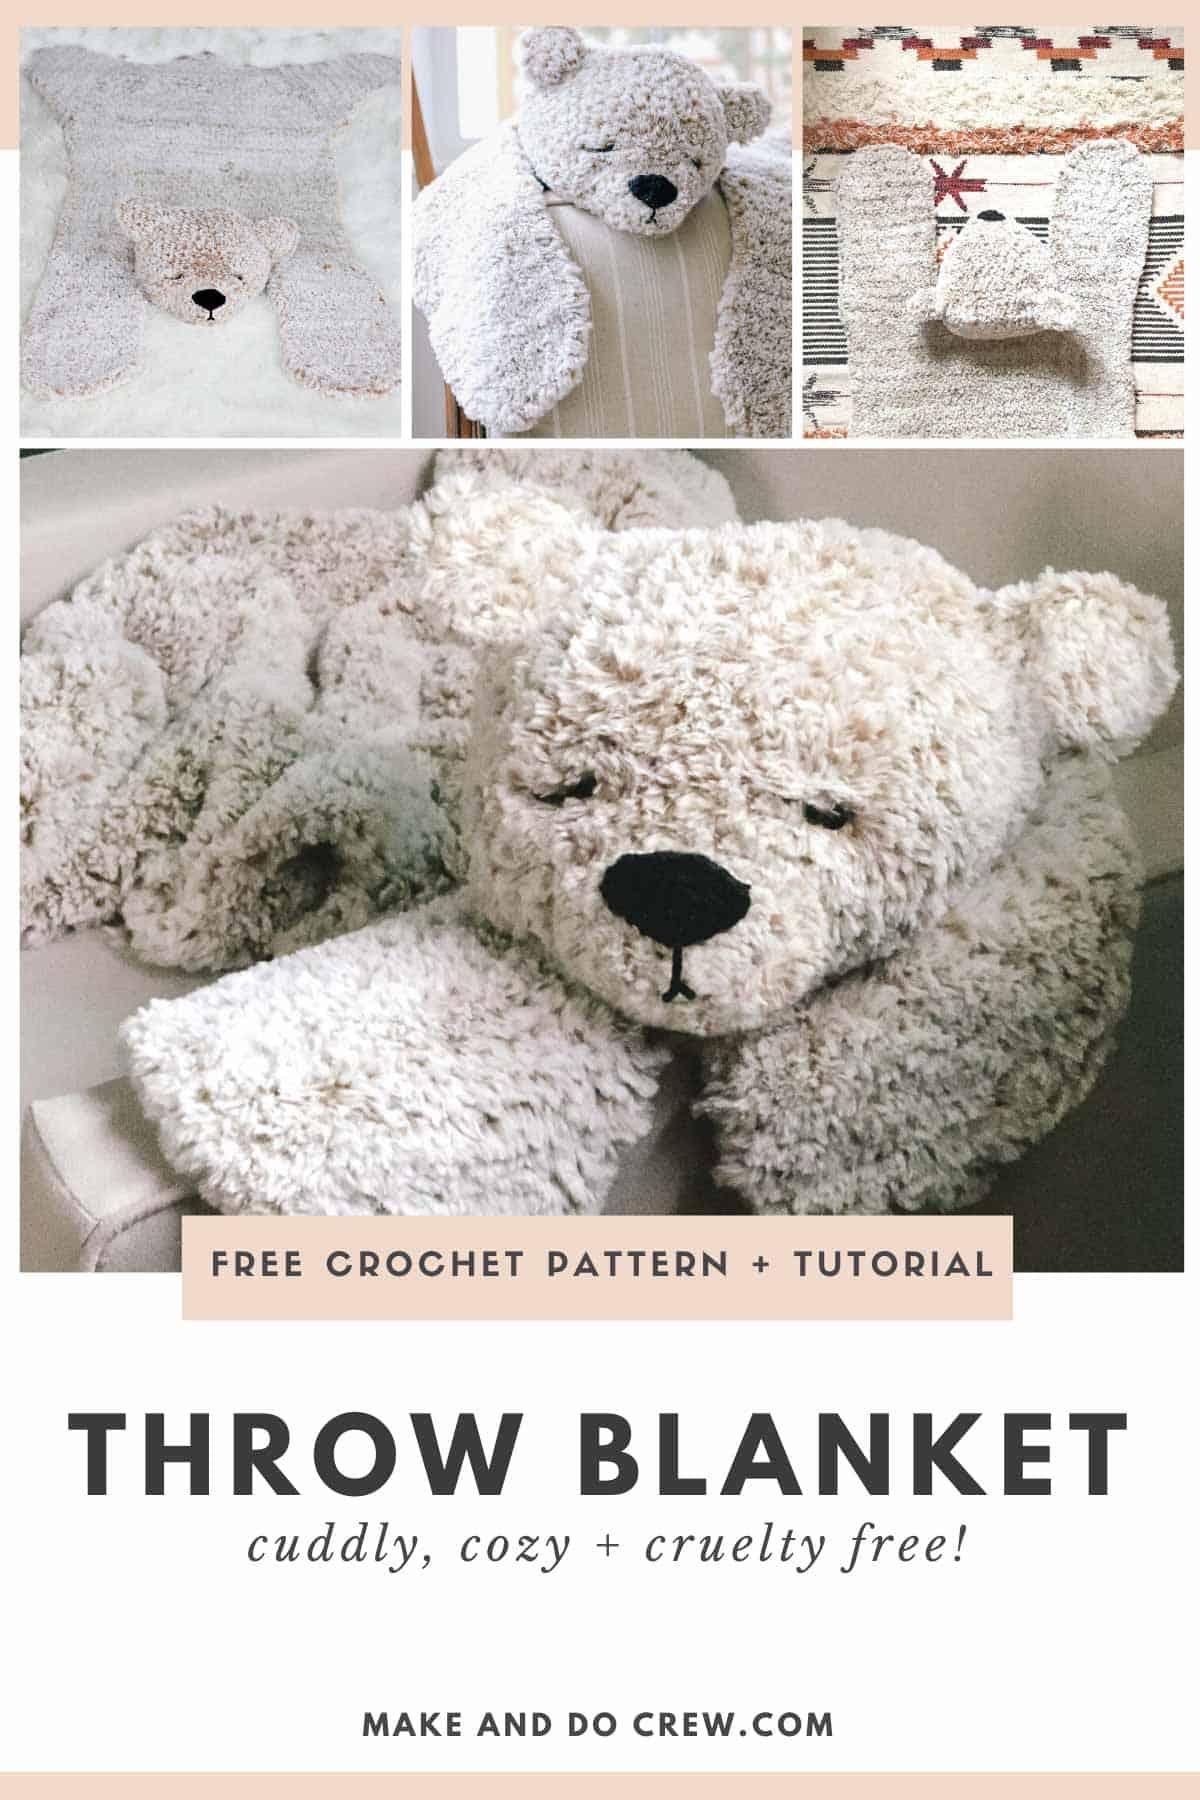 A fuzzy bear crochet blanket that doubles as a rug.